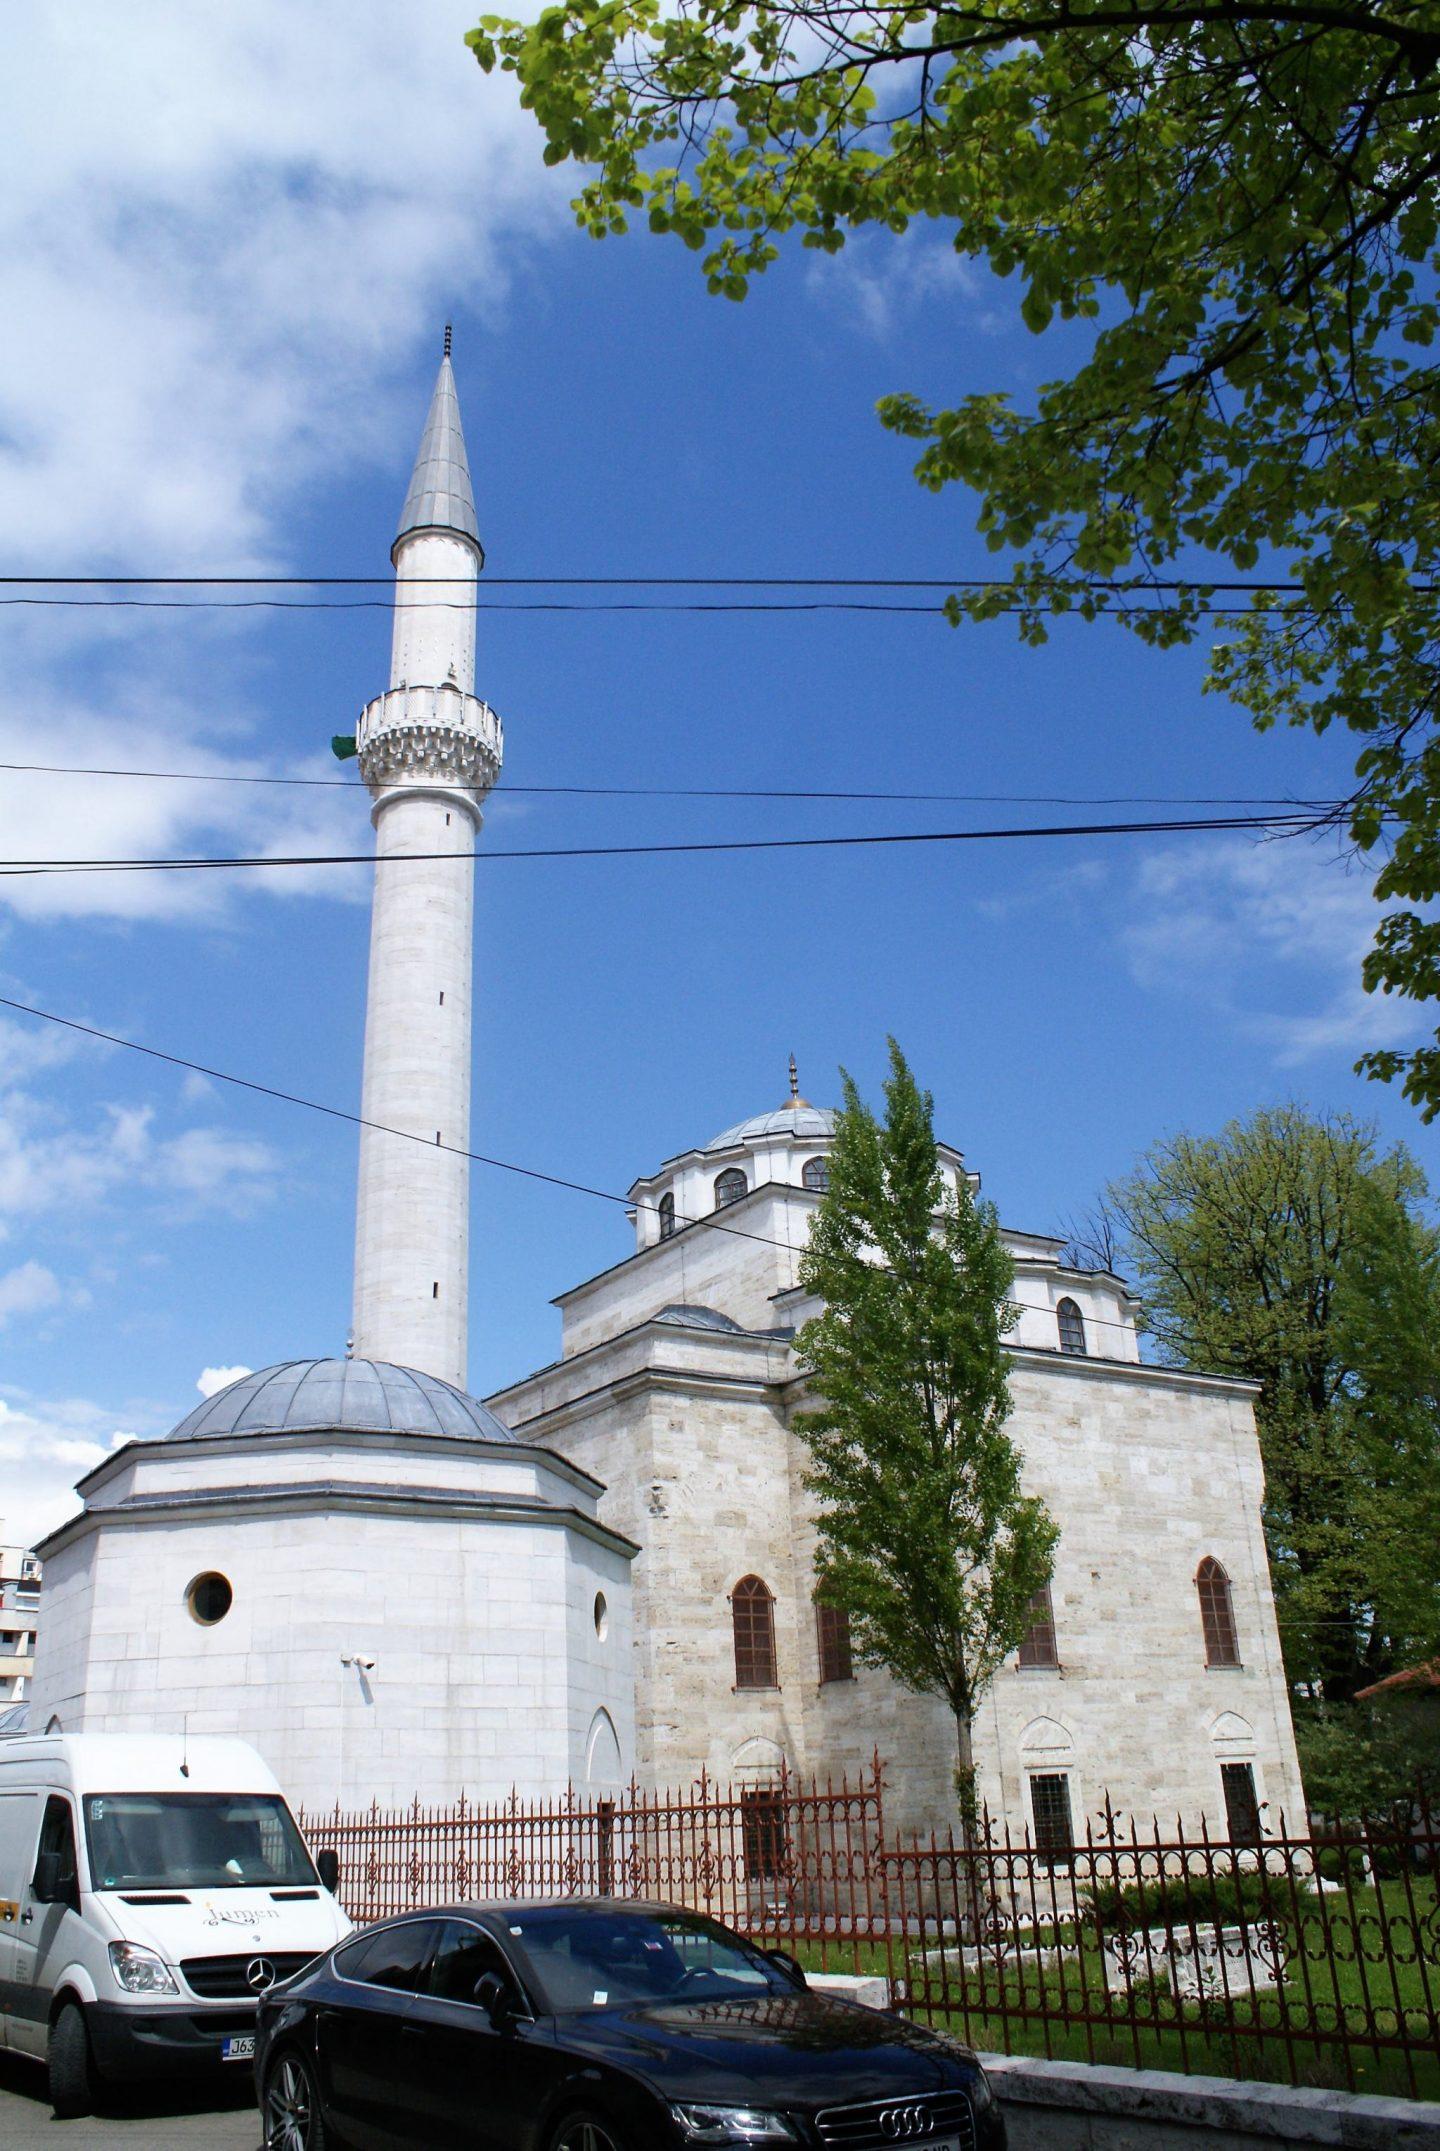 džamija Ferhadija spolja © According to Kristina